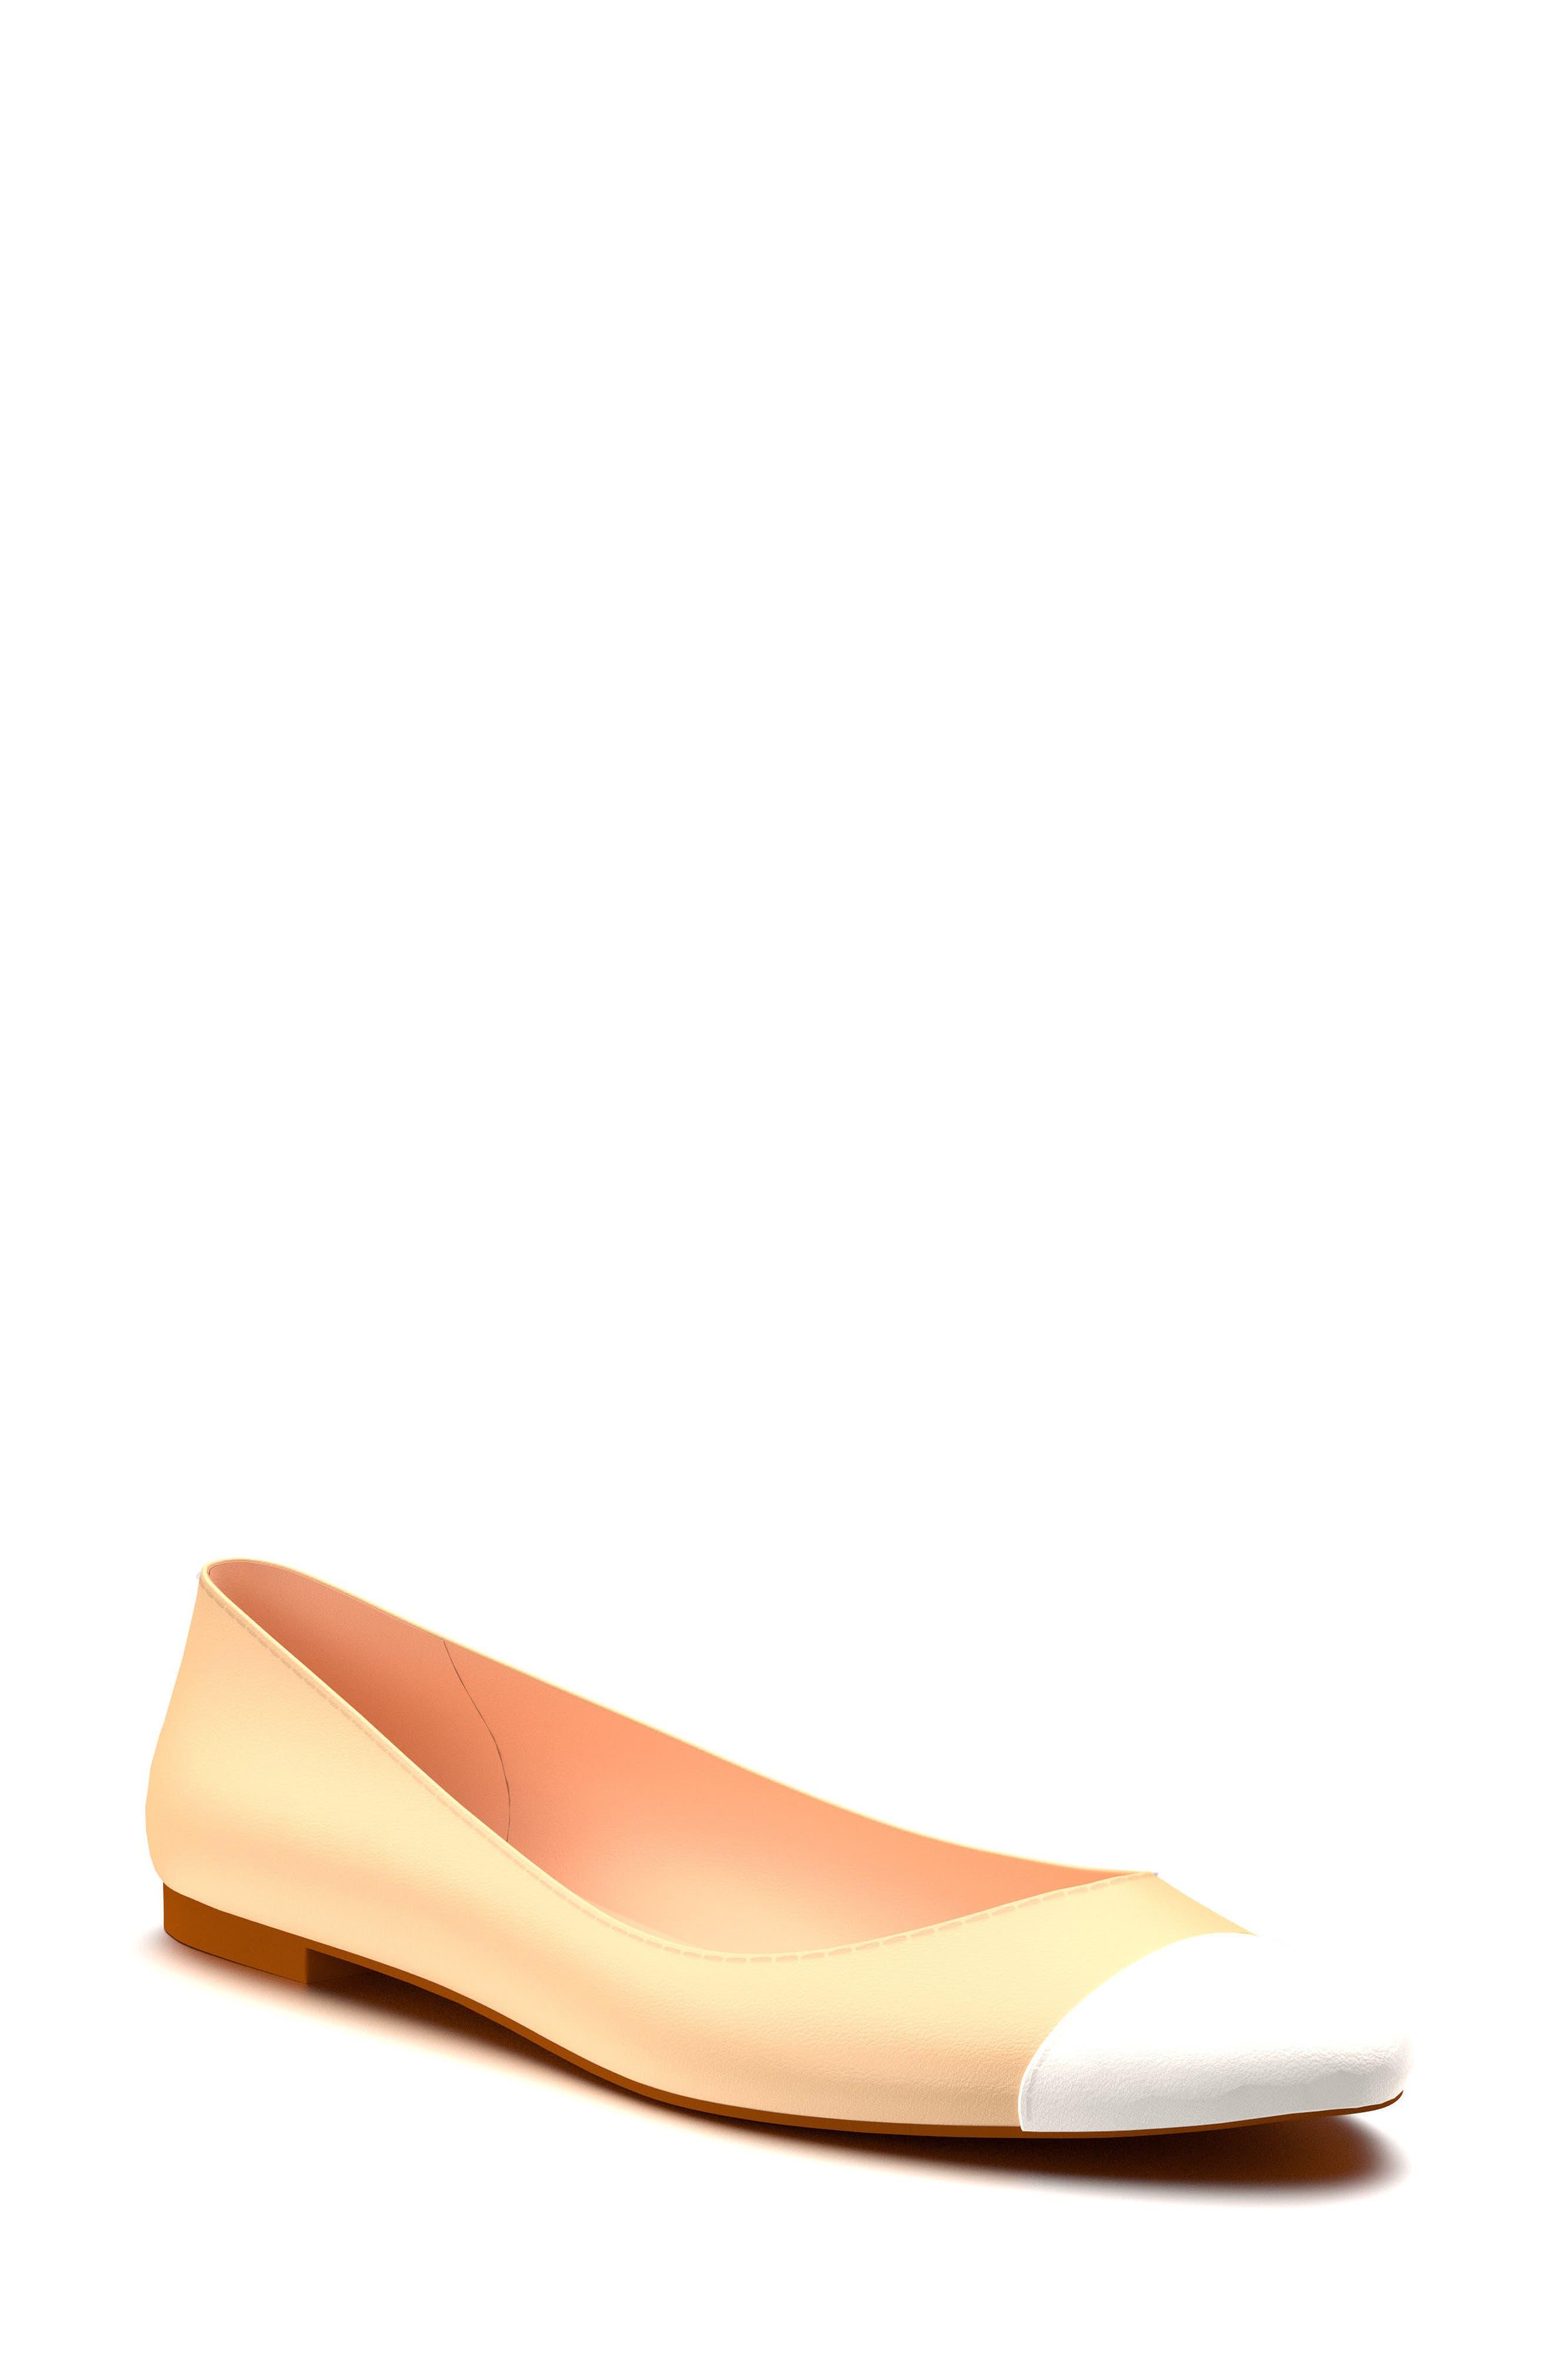 Main Image - Shoes of Prey Cap Toe Ballet Flat (Women)